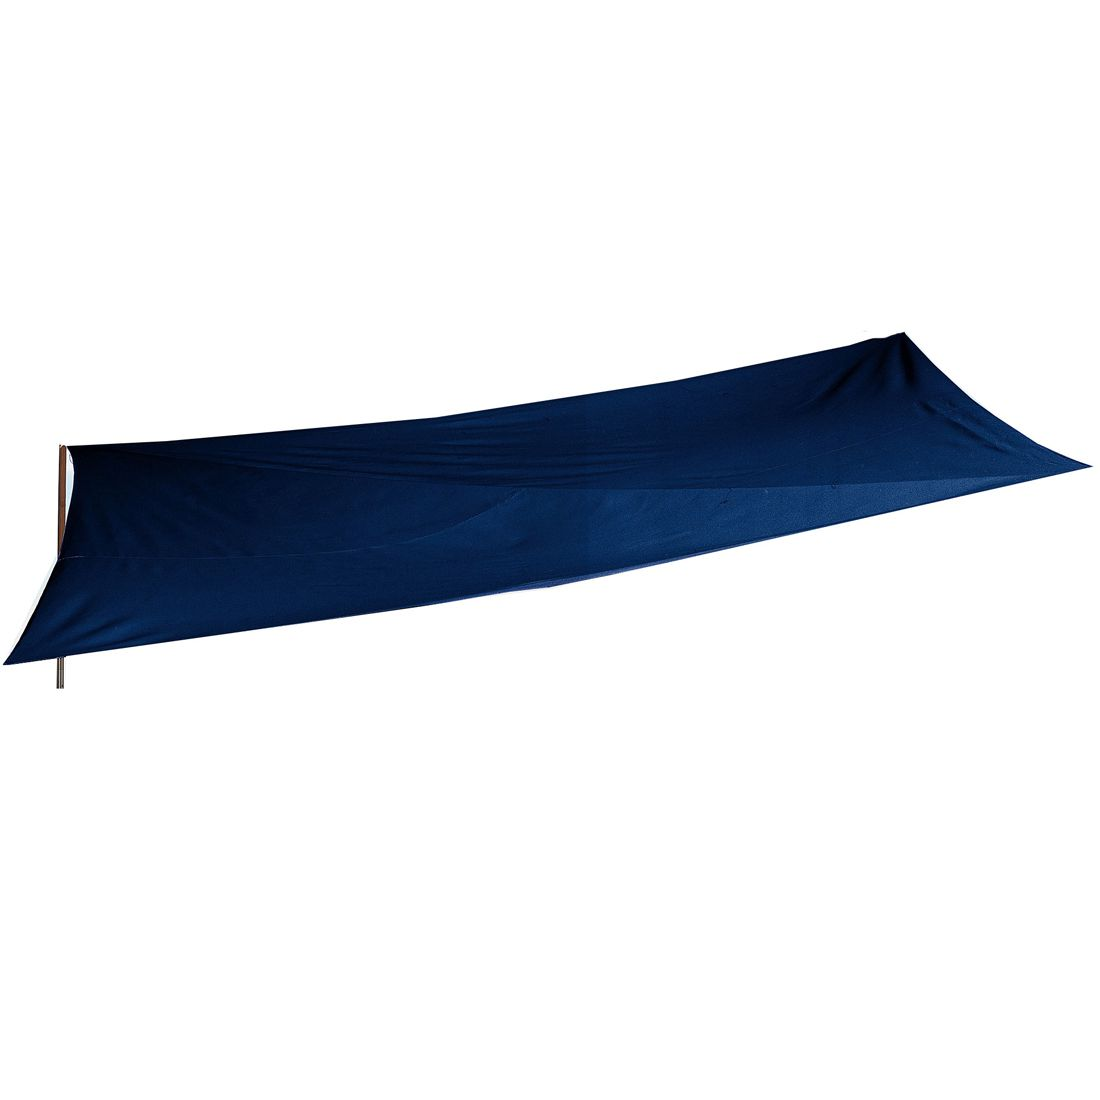 Sonnensegel 3 x 3 m - Polyester - blau, Pure Day